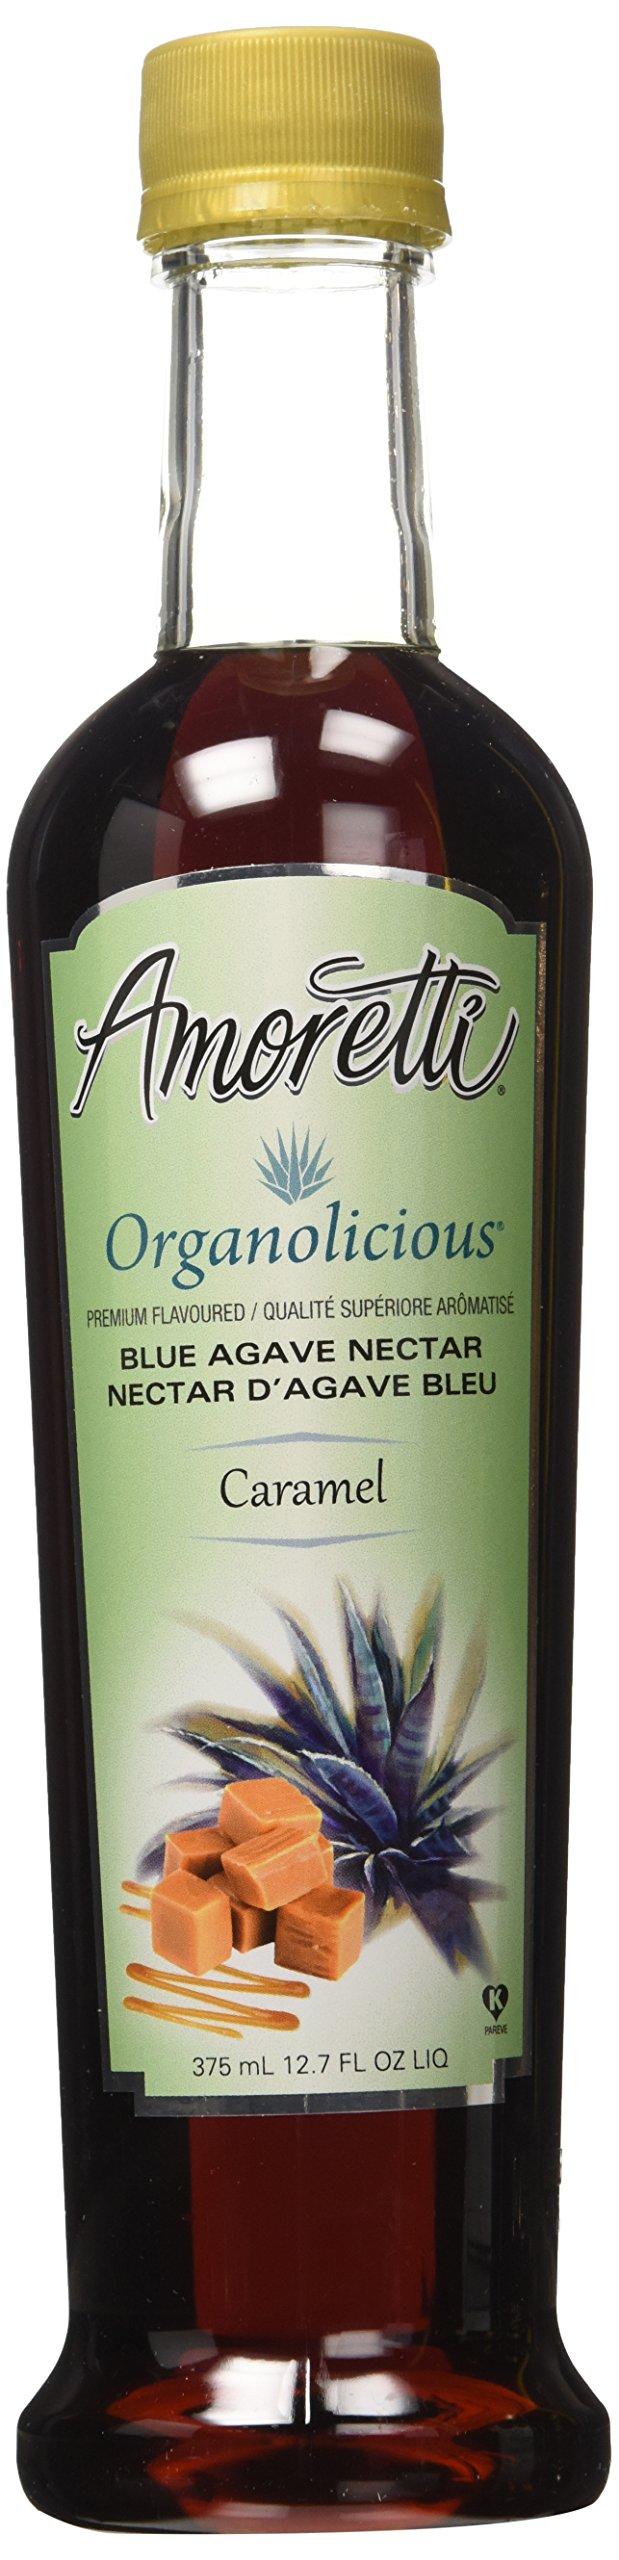 Amoretti Premium Organolicious Blue Agave Nectar, Caramel Flavored, 12.7 Fluid Ounce